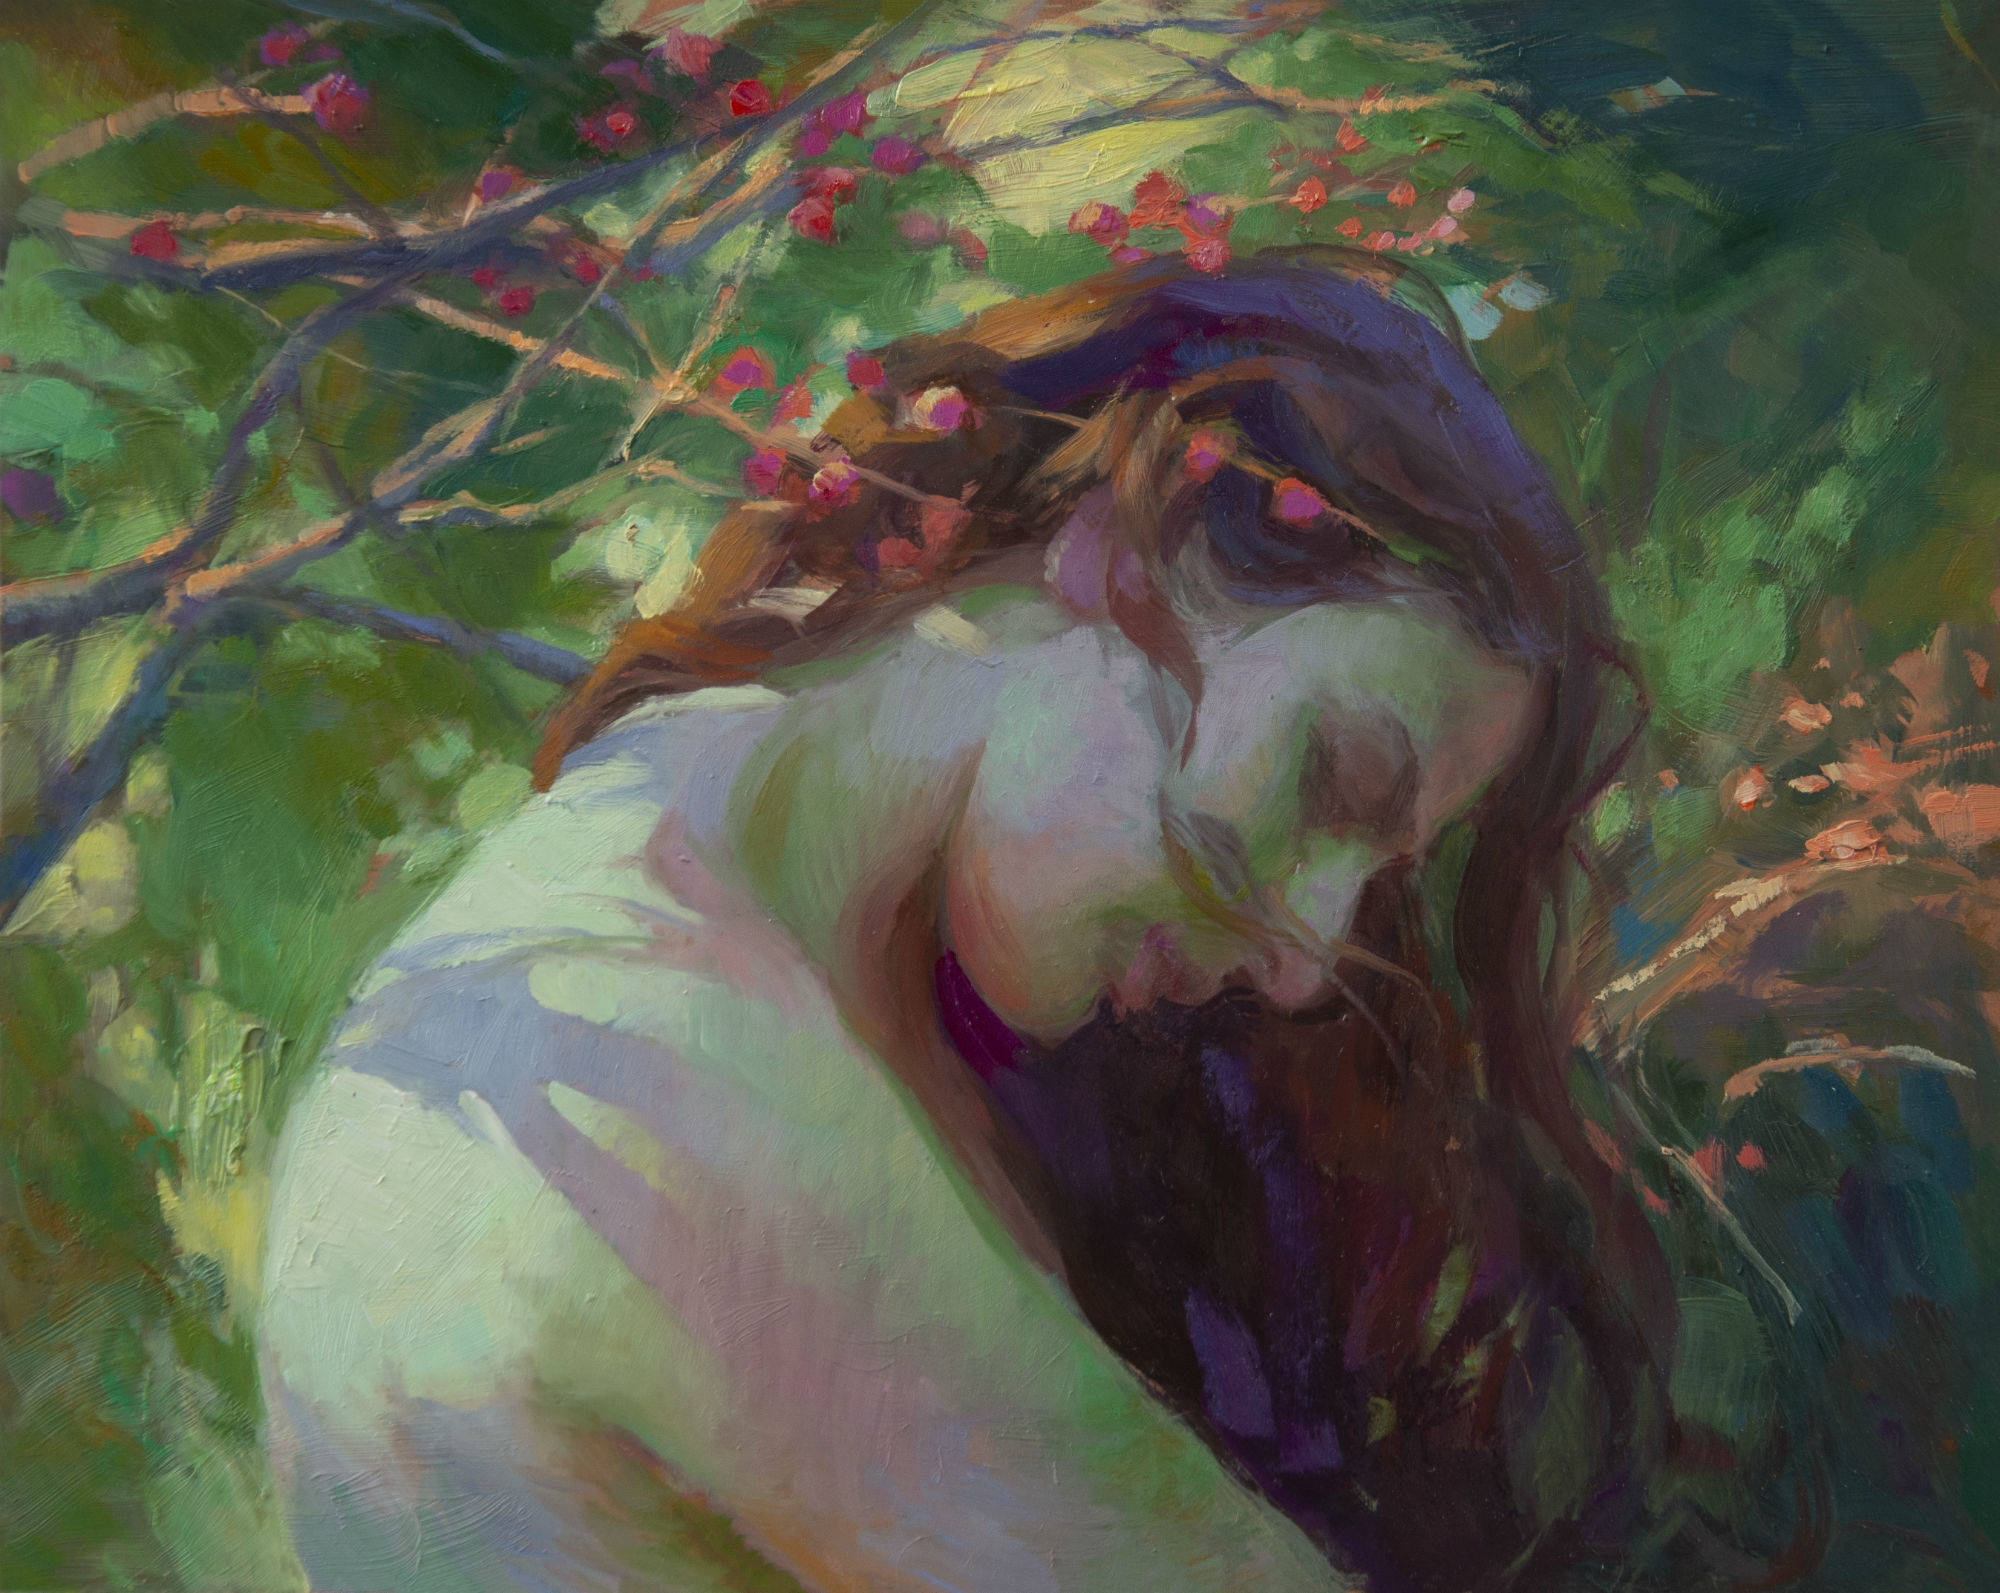 Persephone II by Adrienne Stein